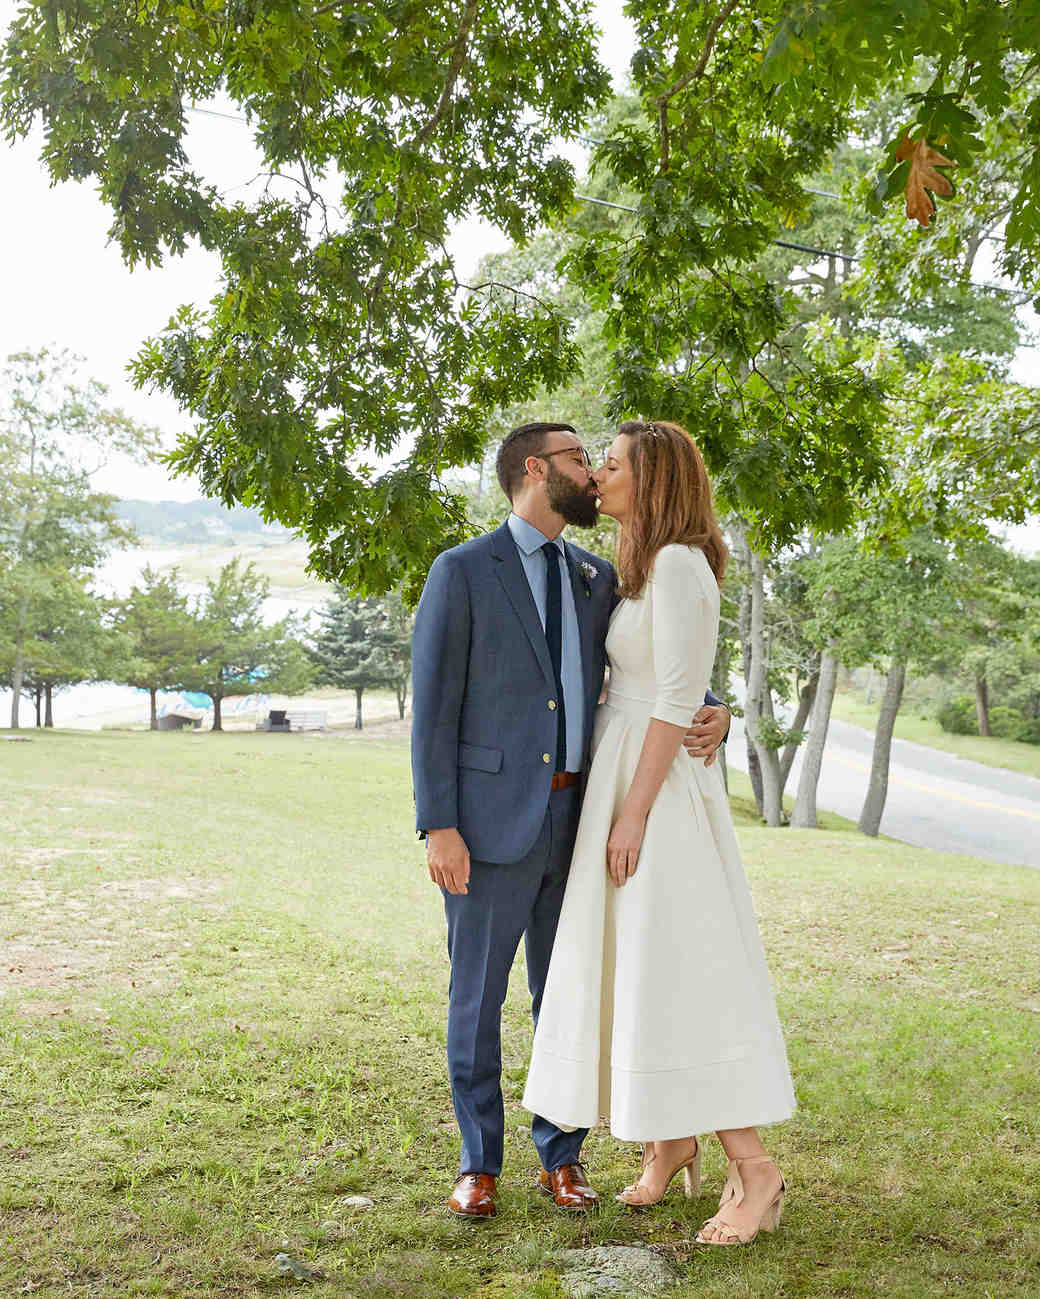 Wedding tin: a union, time-tested